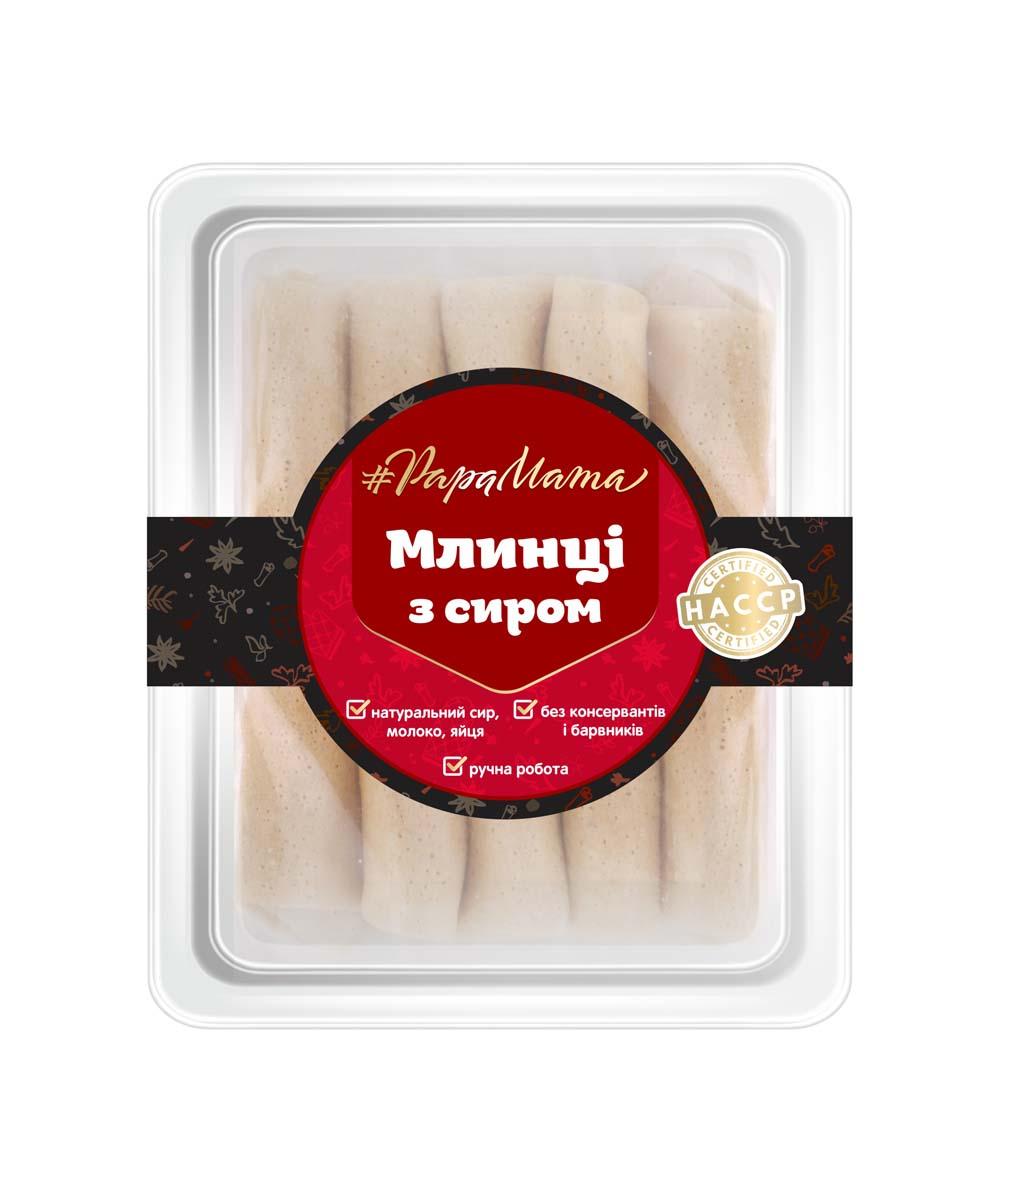 PapaMama label design